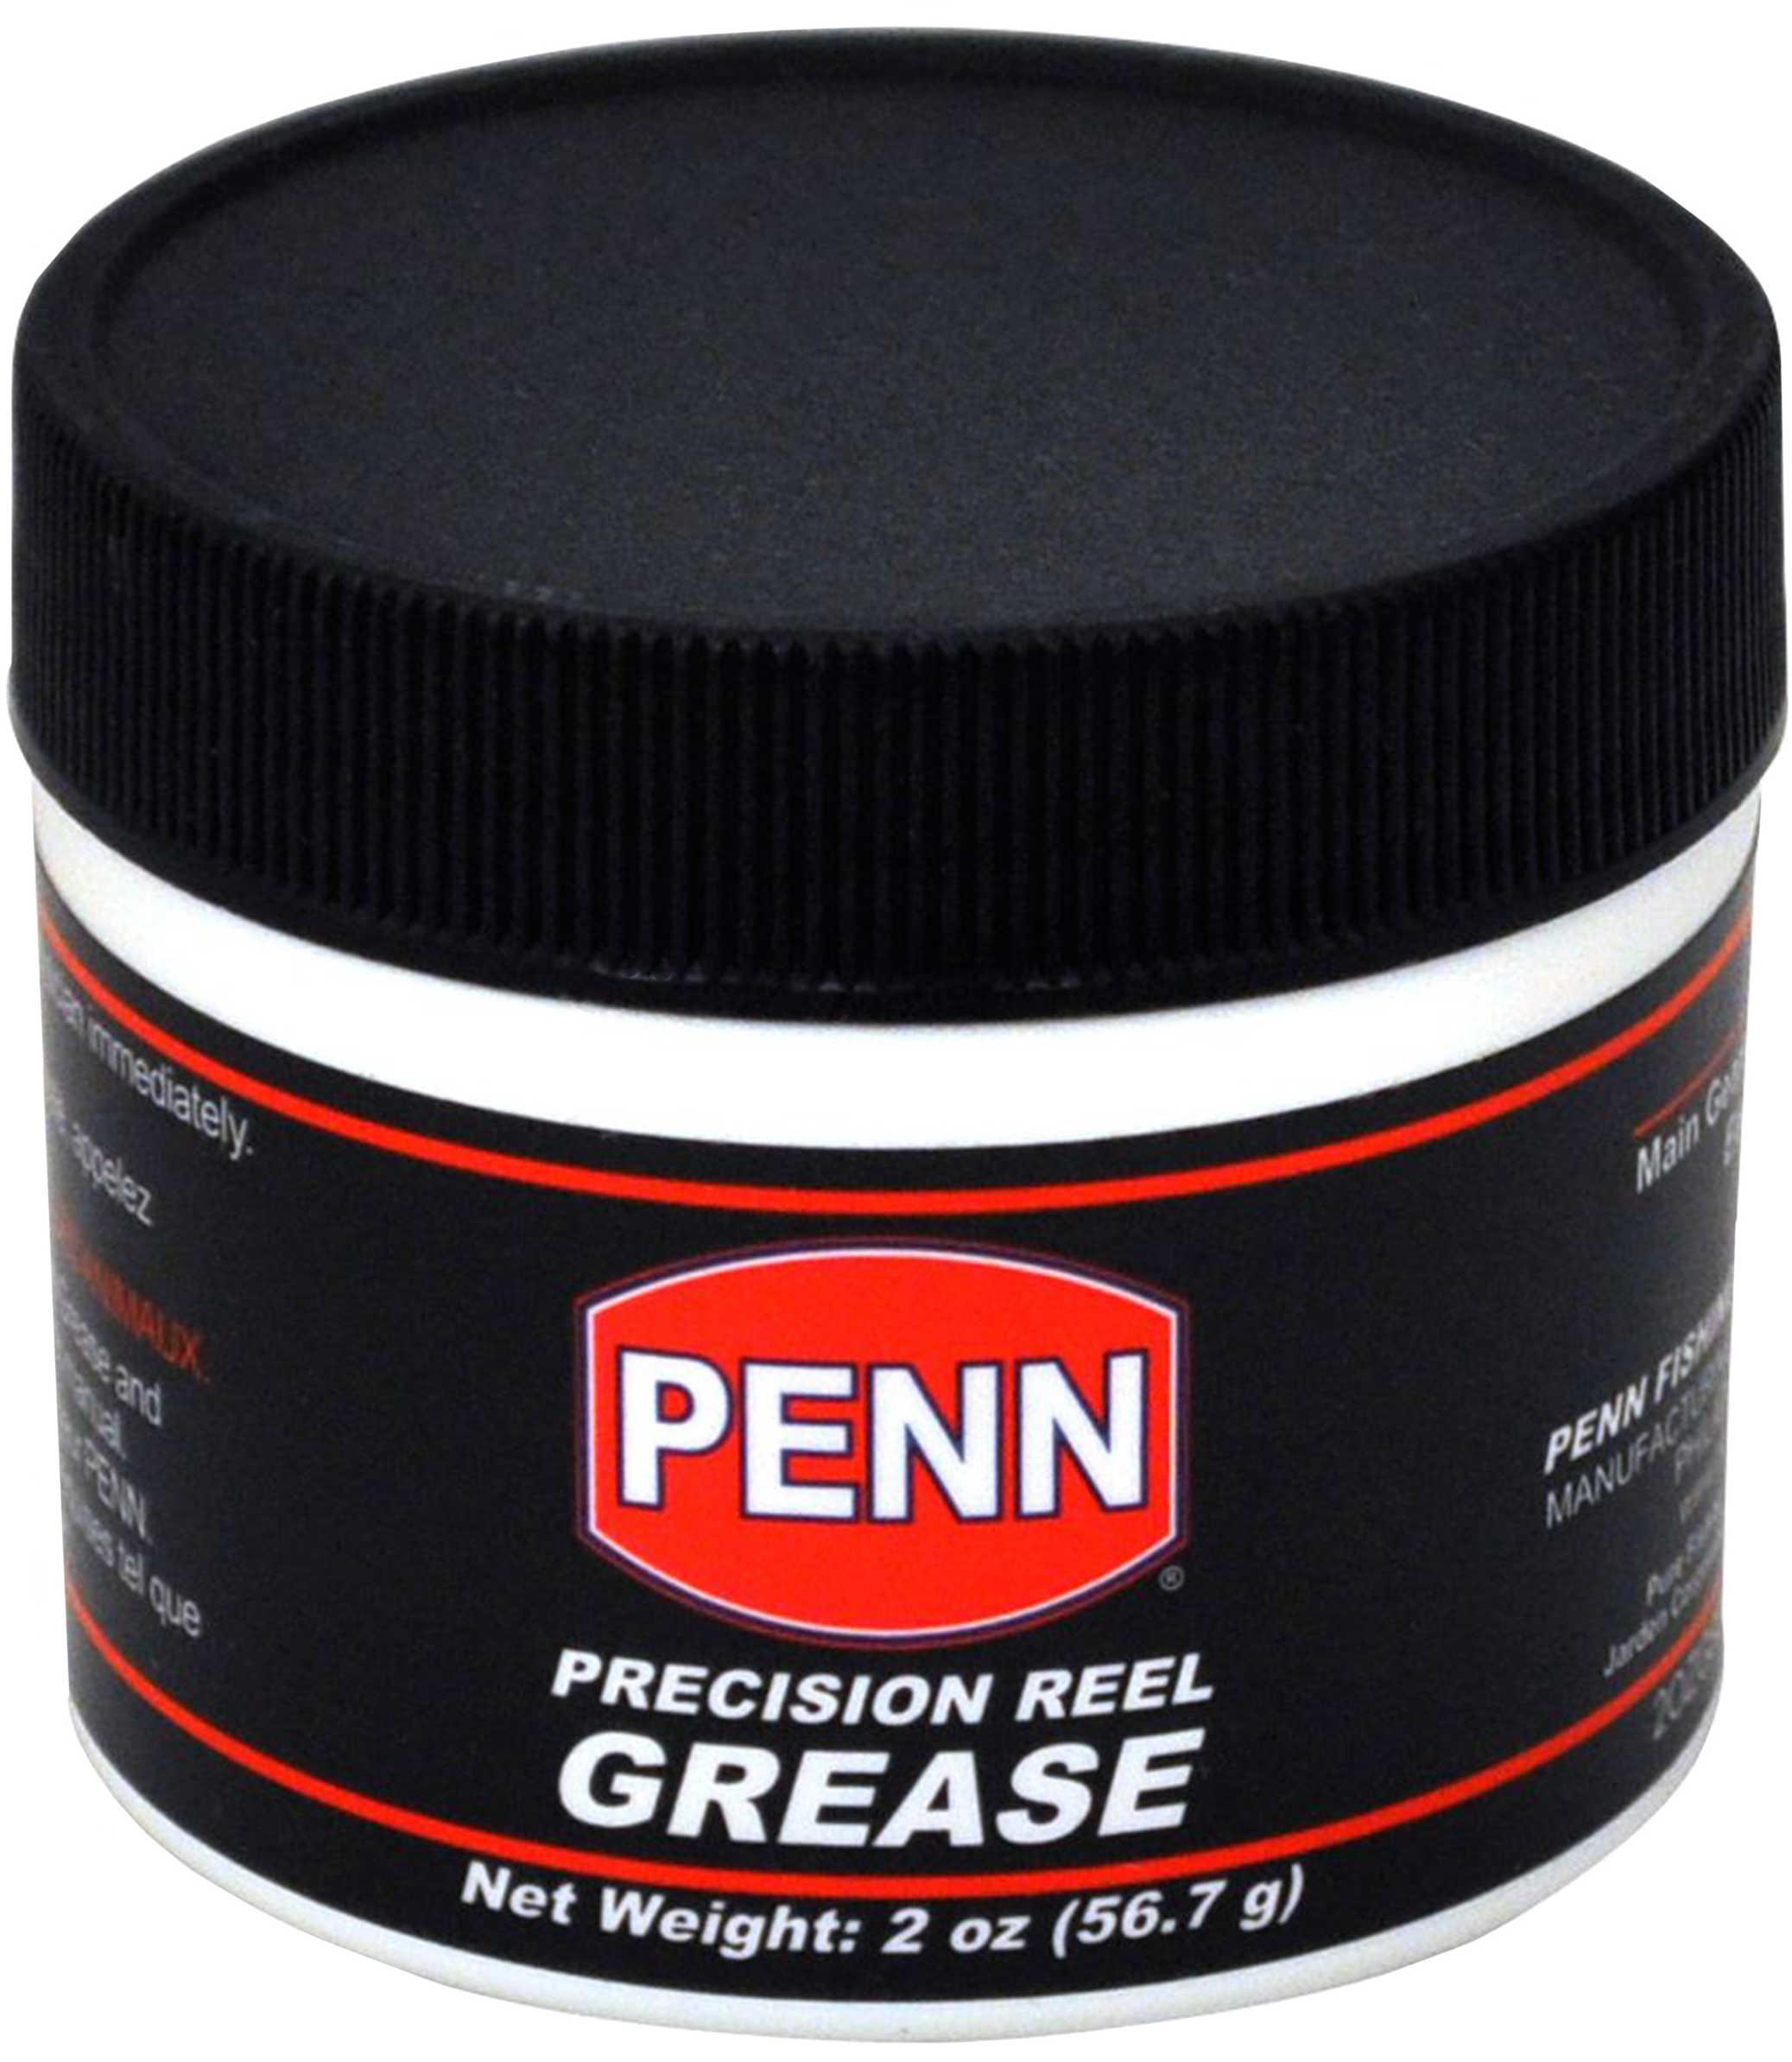 Penn Reel Grease 2oz Tub Md#: 2OZGESD12